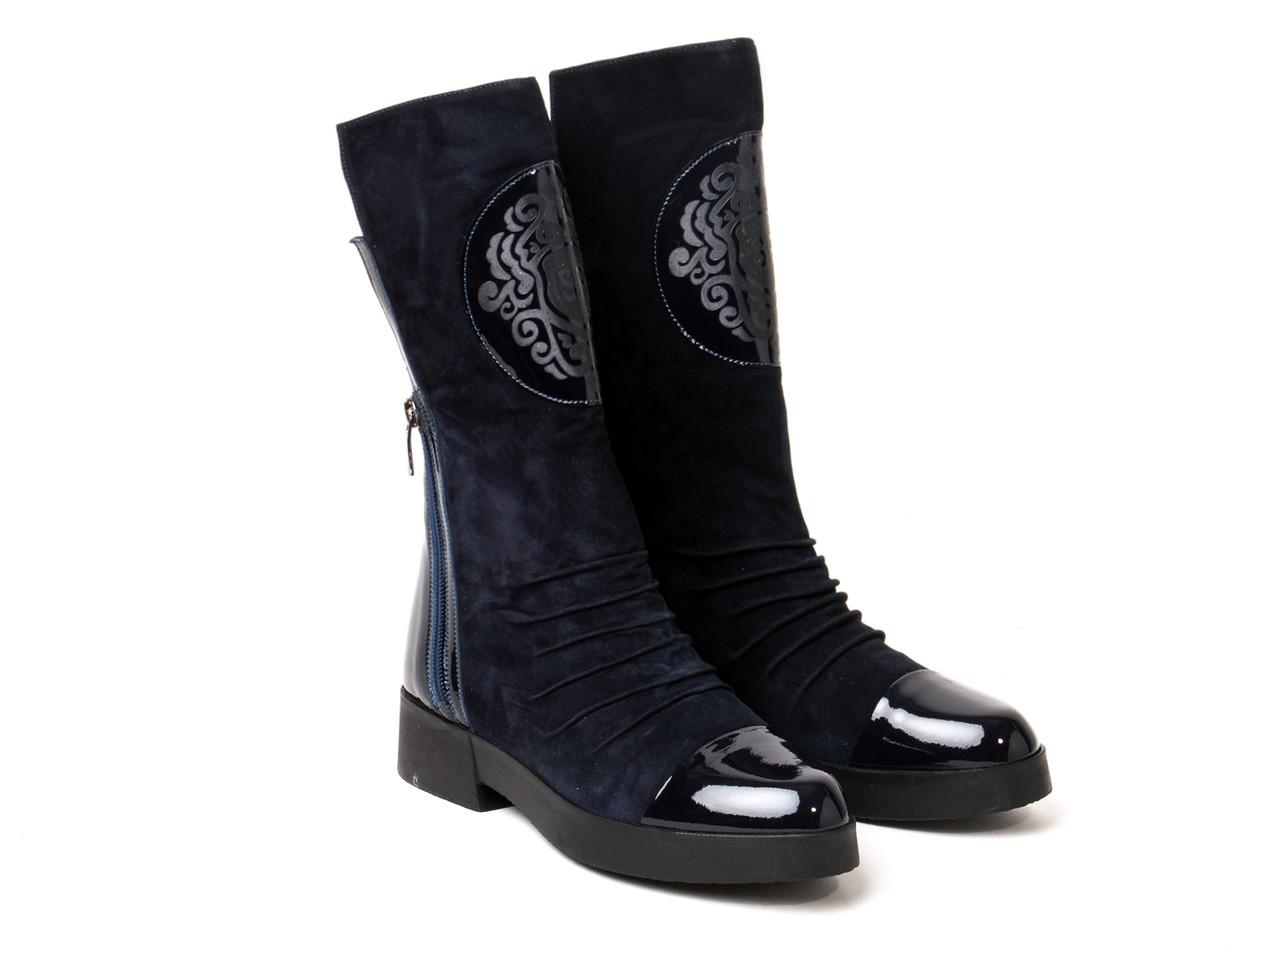 Ботинки Etor 4987-0-7235 синие